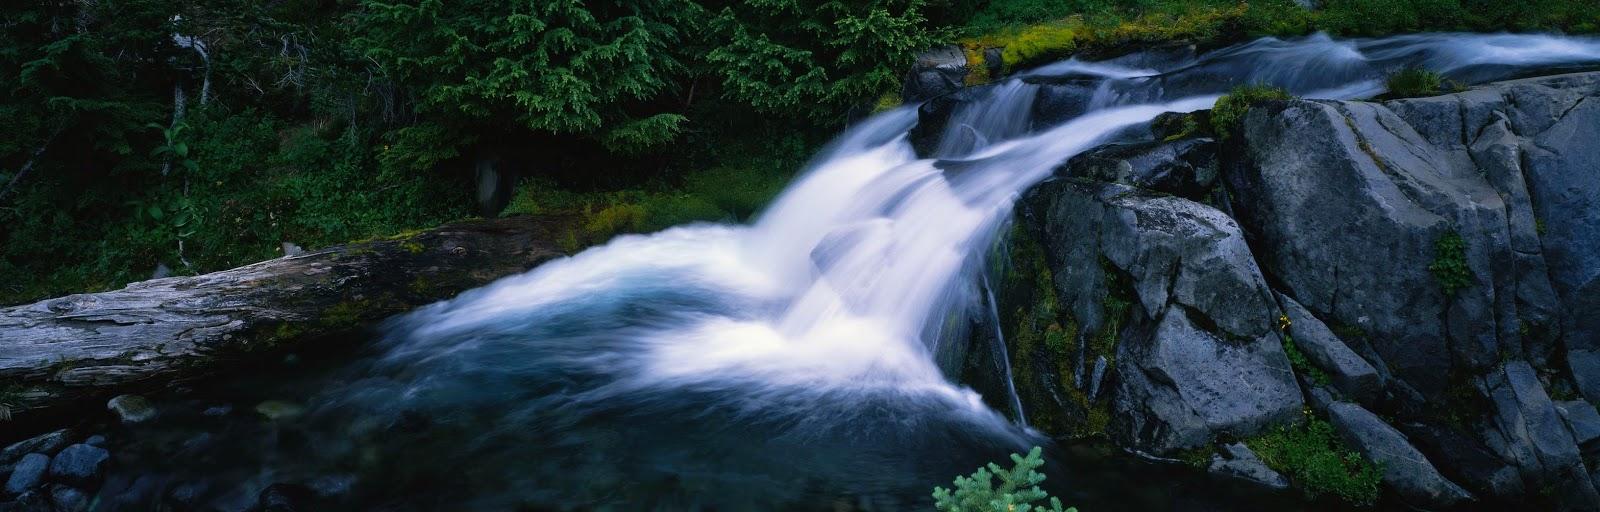 Green jungle waterfall free hd desktop wallpaper